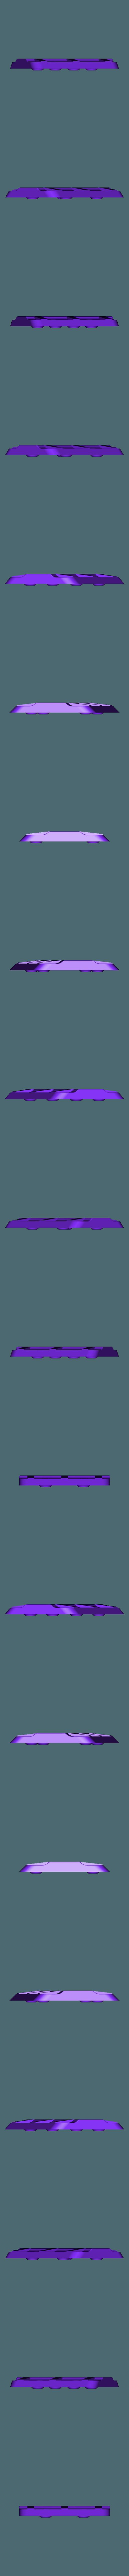 MID_SKID_BSR_BERSERKER.stl Télécharger fichier STL gratuit PATINS BERSERKER BSR (MILIEU ET ARRIÈRE) • Plan imprimable en 3D, peterbroeders